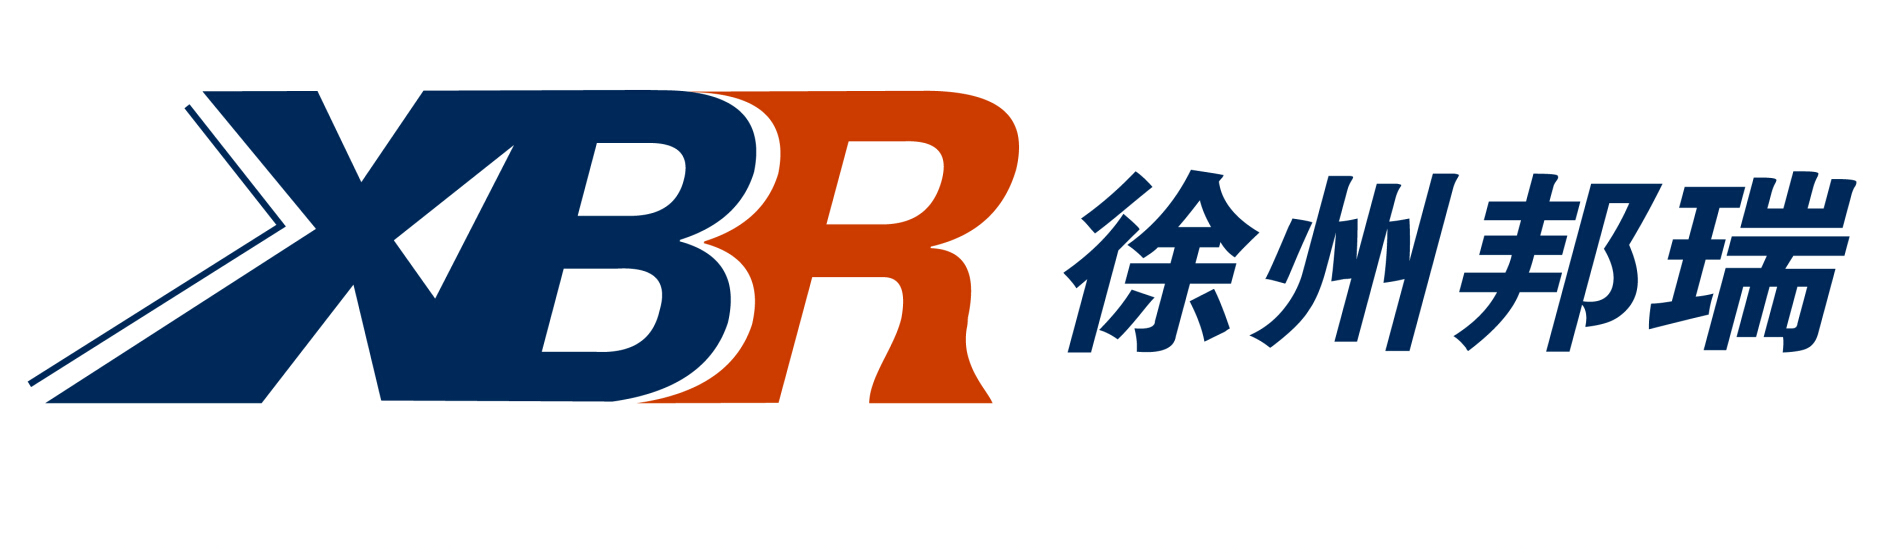 XBR International - Xuzhou Bangrui International Trade Co.,Ltd Main Image